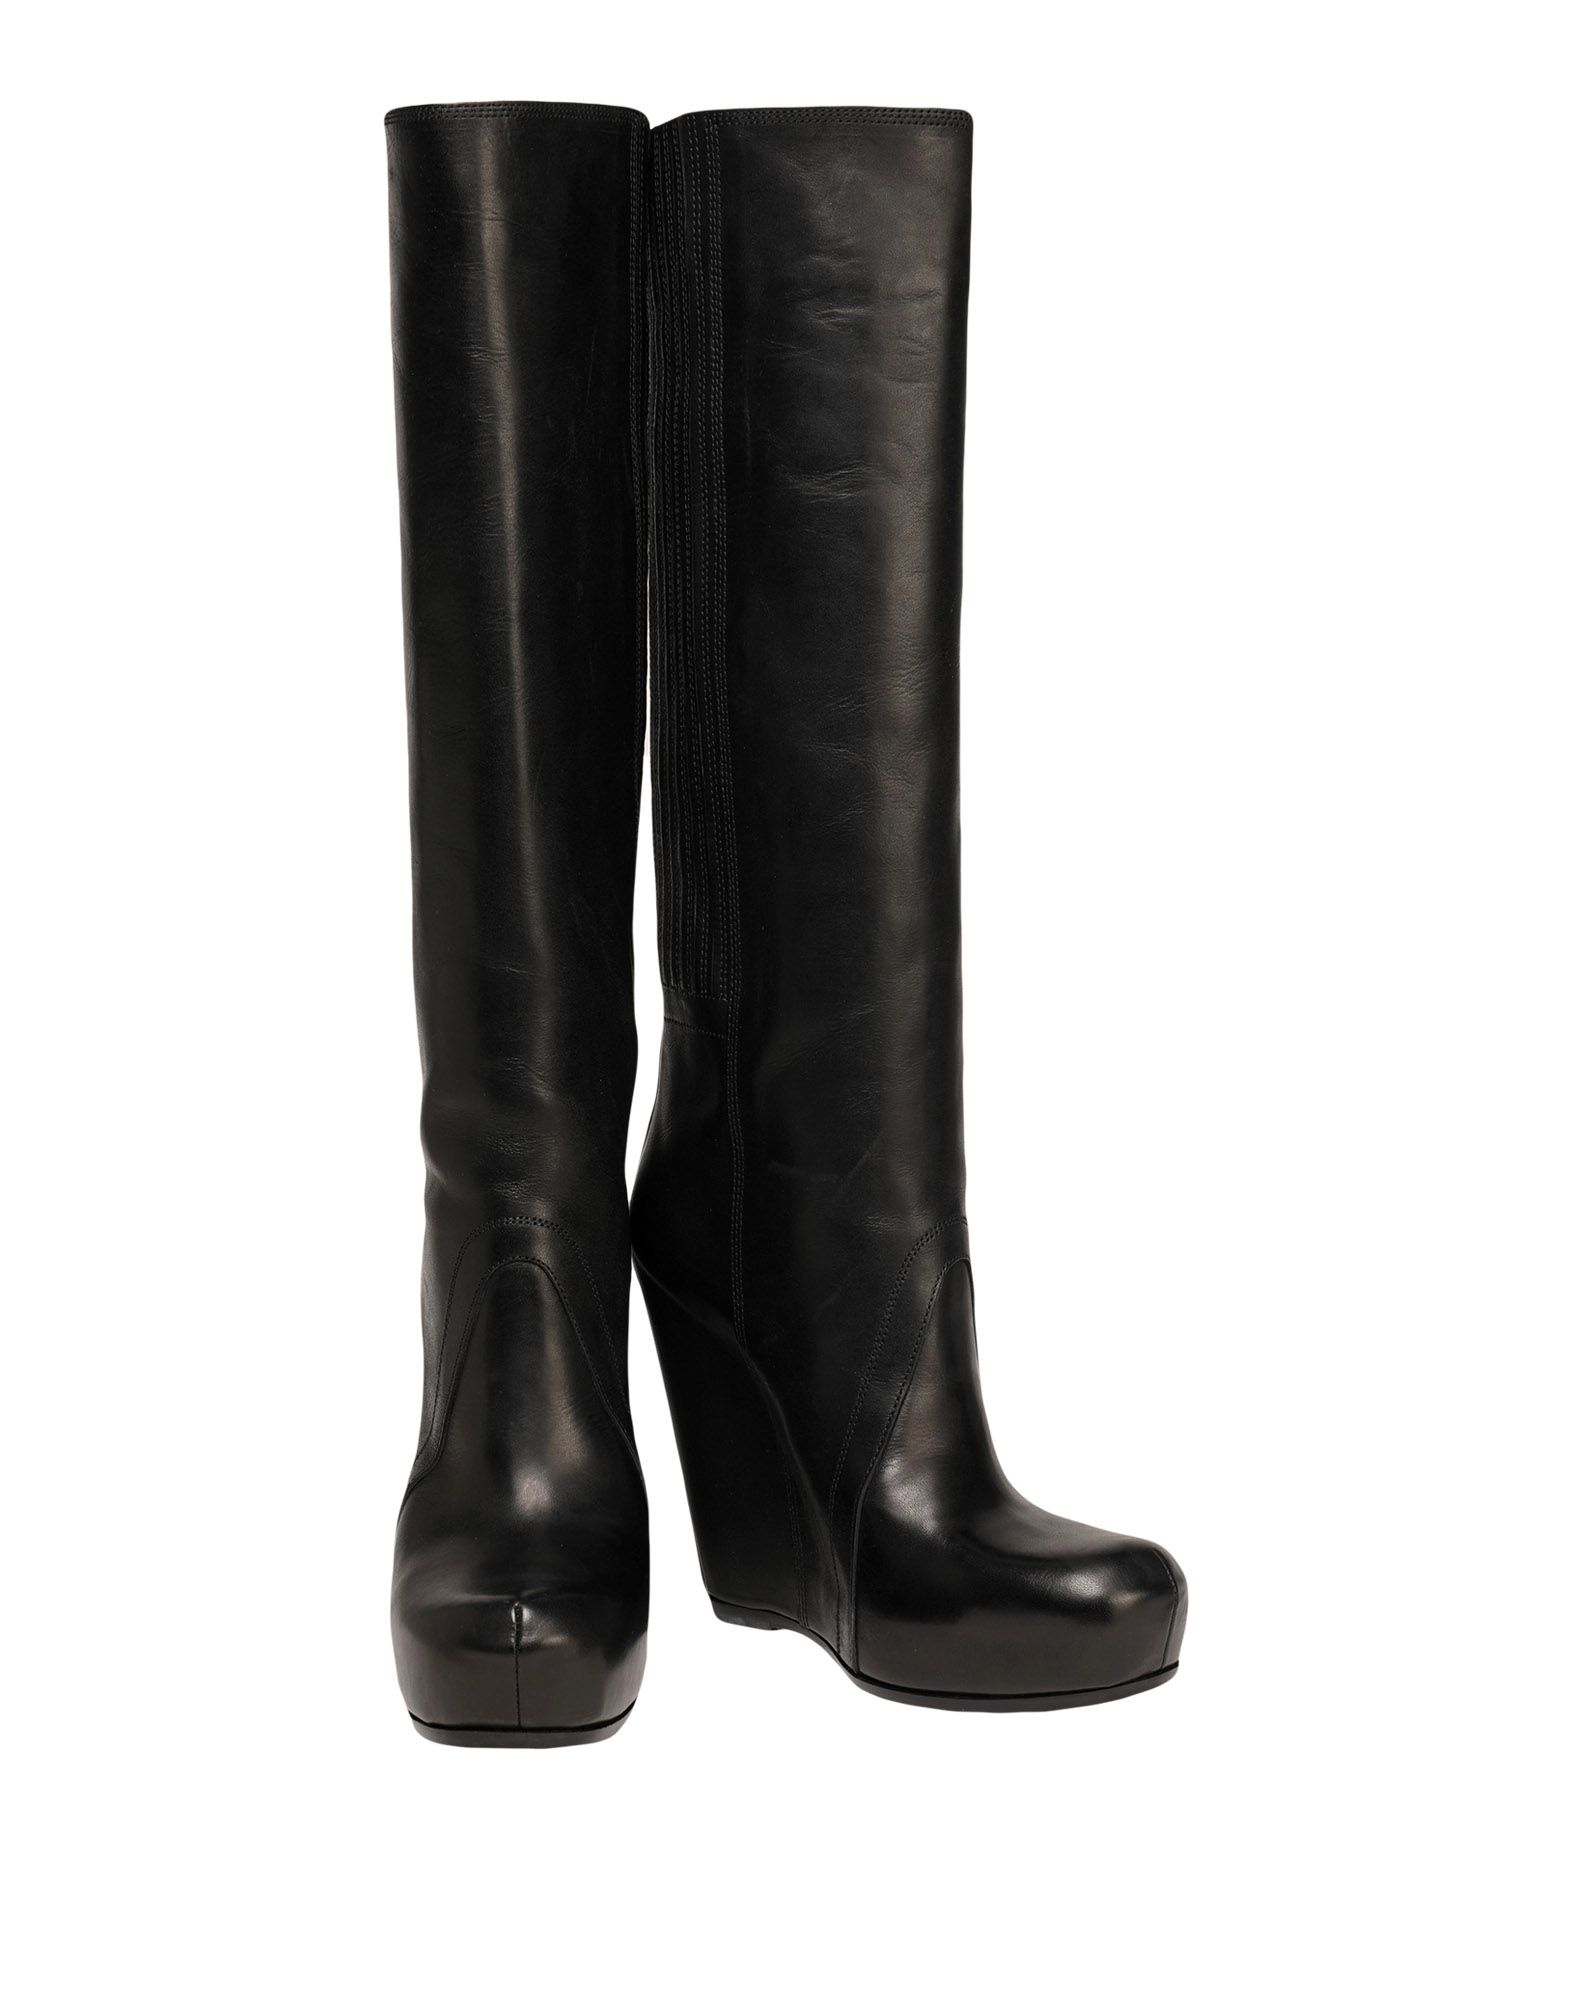 Rick Owens Boots - Women Rick Owens Australia Boots online on  Australia Owens - 11518046MR 7bbb34